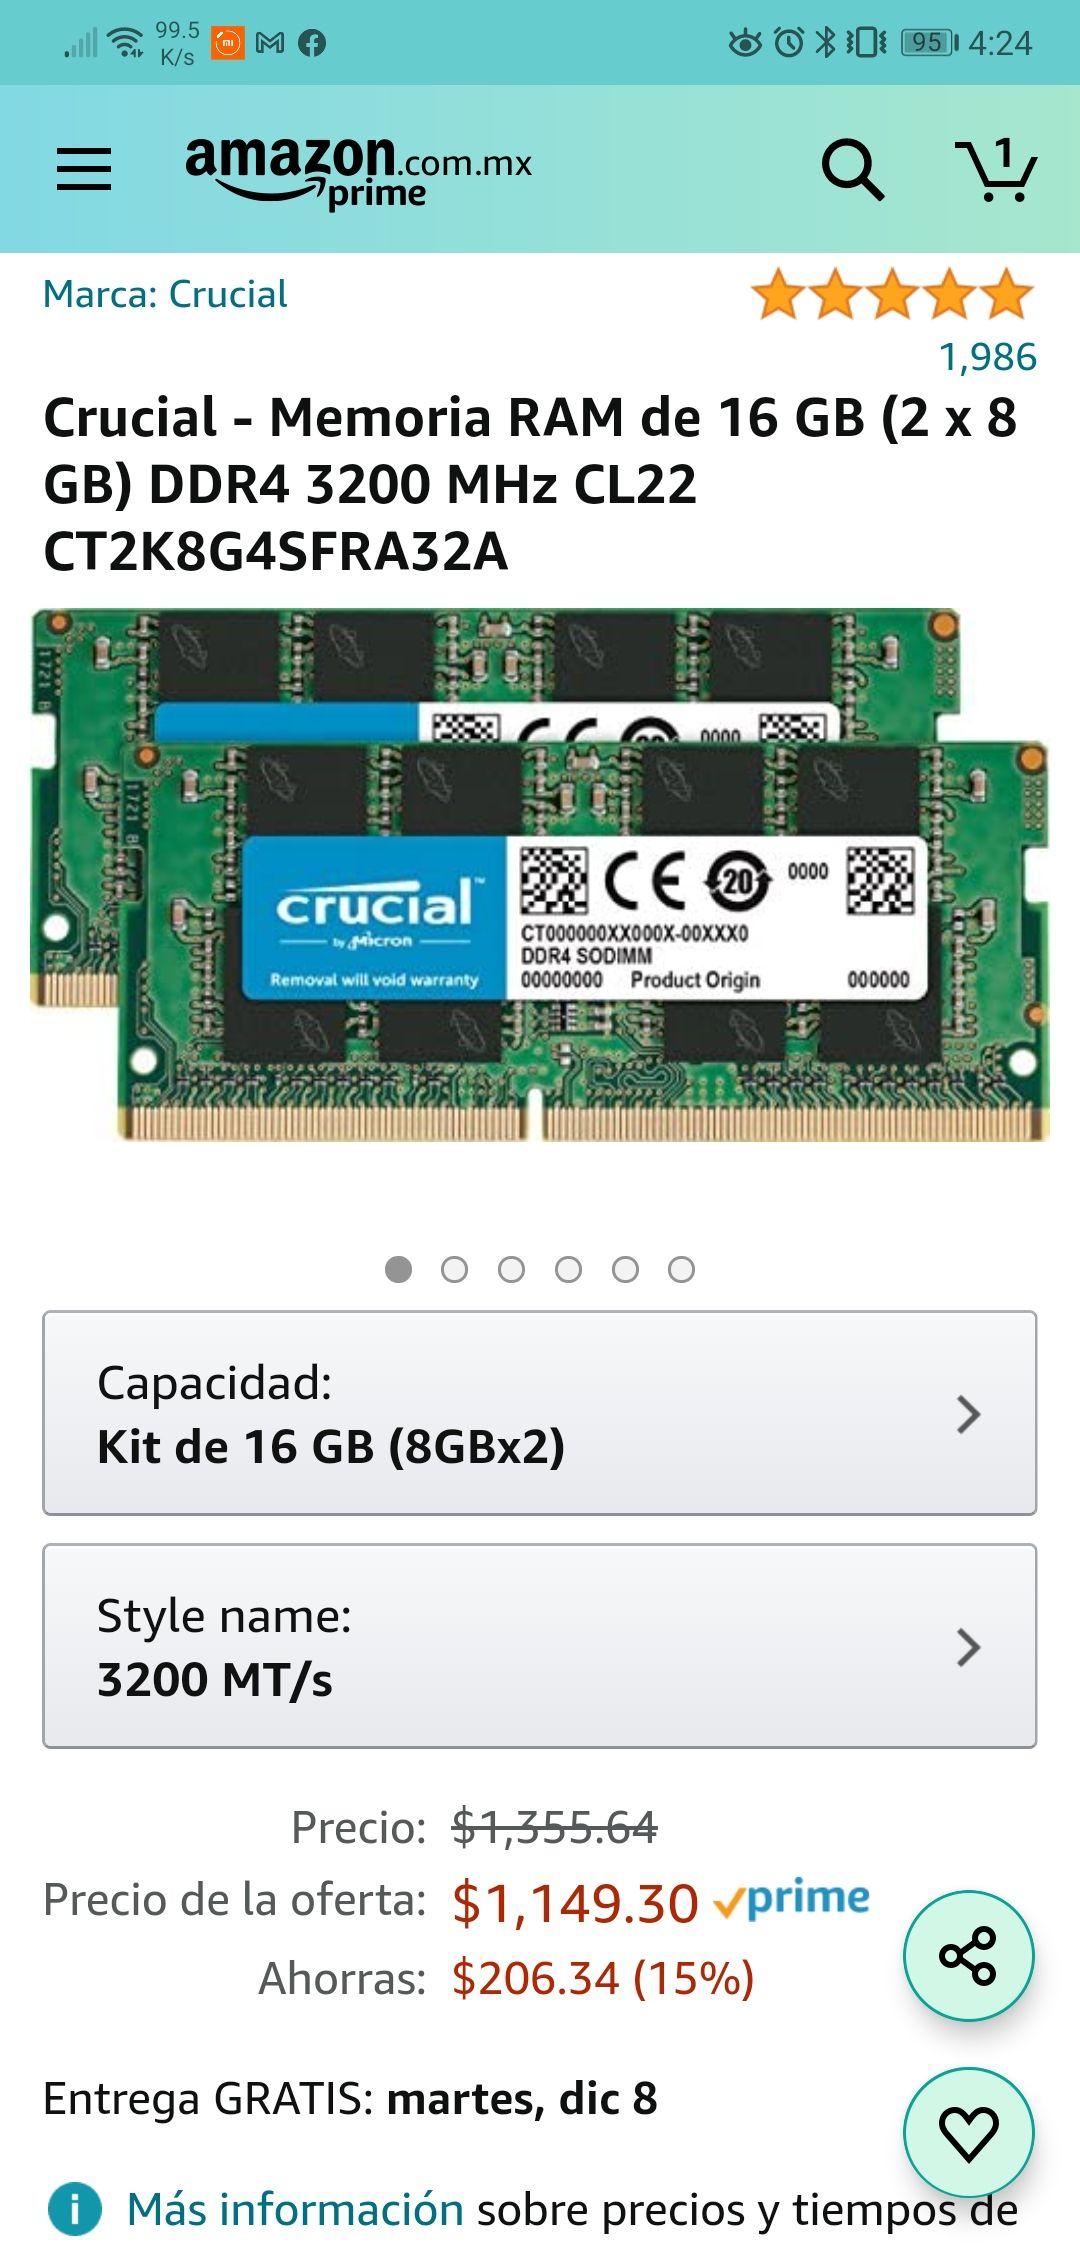 Amazon: Crucial - Memoria RAM de 16 GB (2 x 8 GB) DDR4 3200 MHz CL22 CT2K8G4SFRA32A